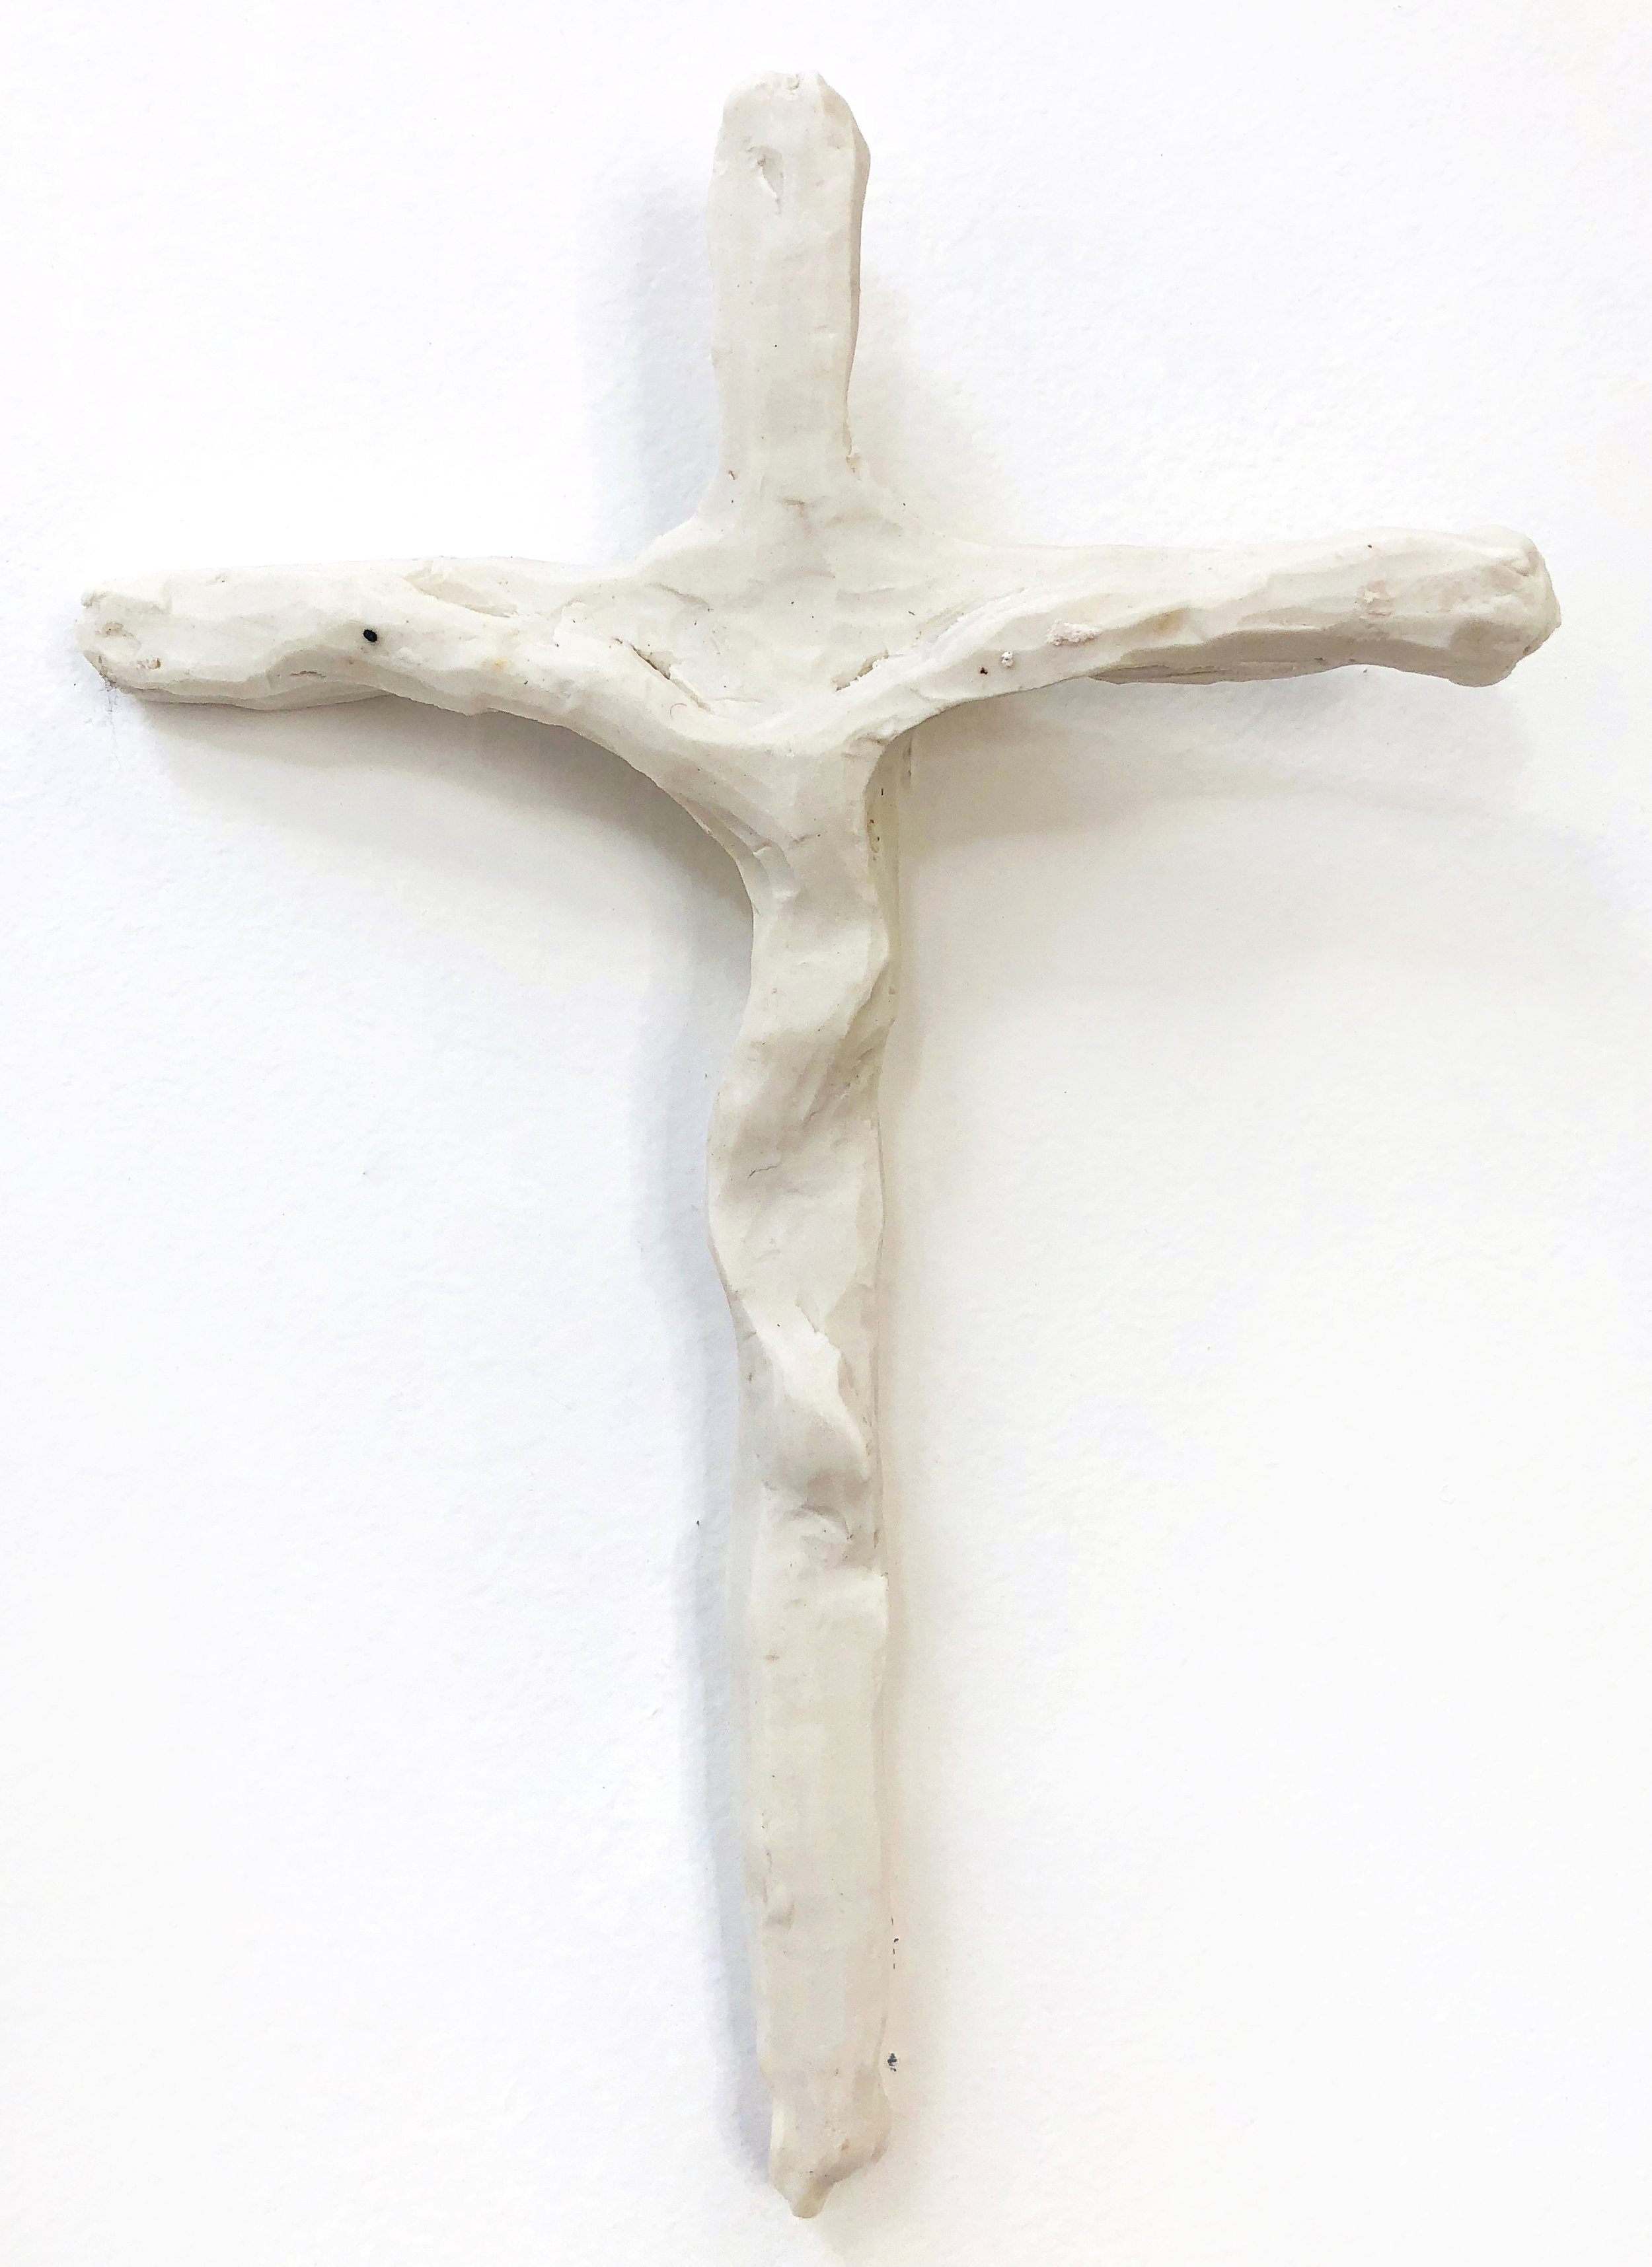 30-240x165-$1150-RichardLewer-Crucifix.jpg